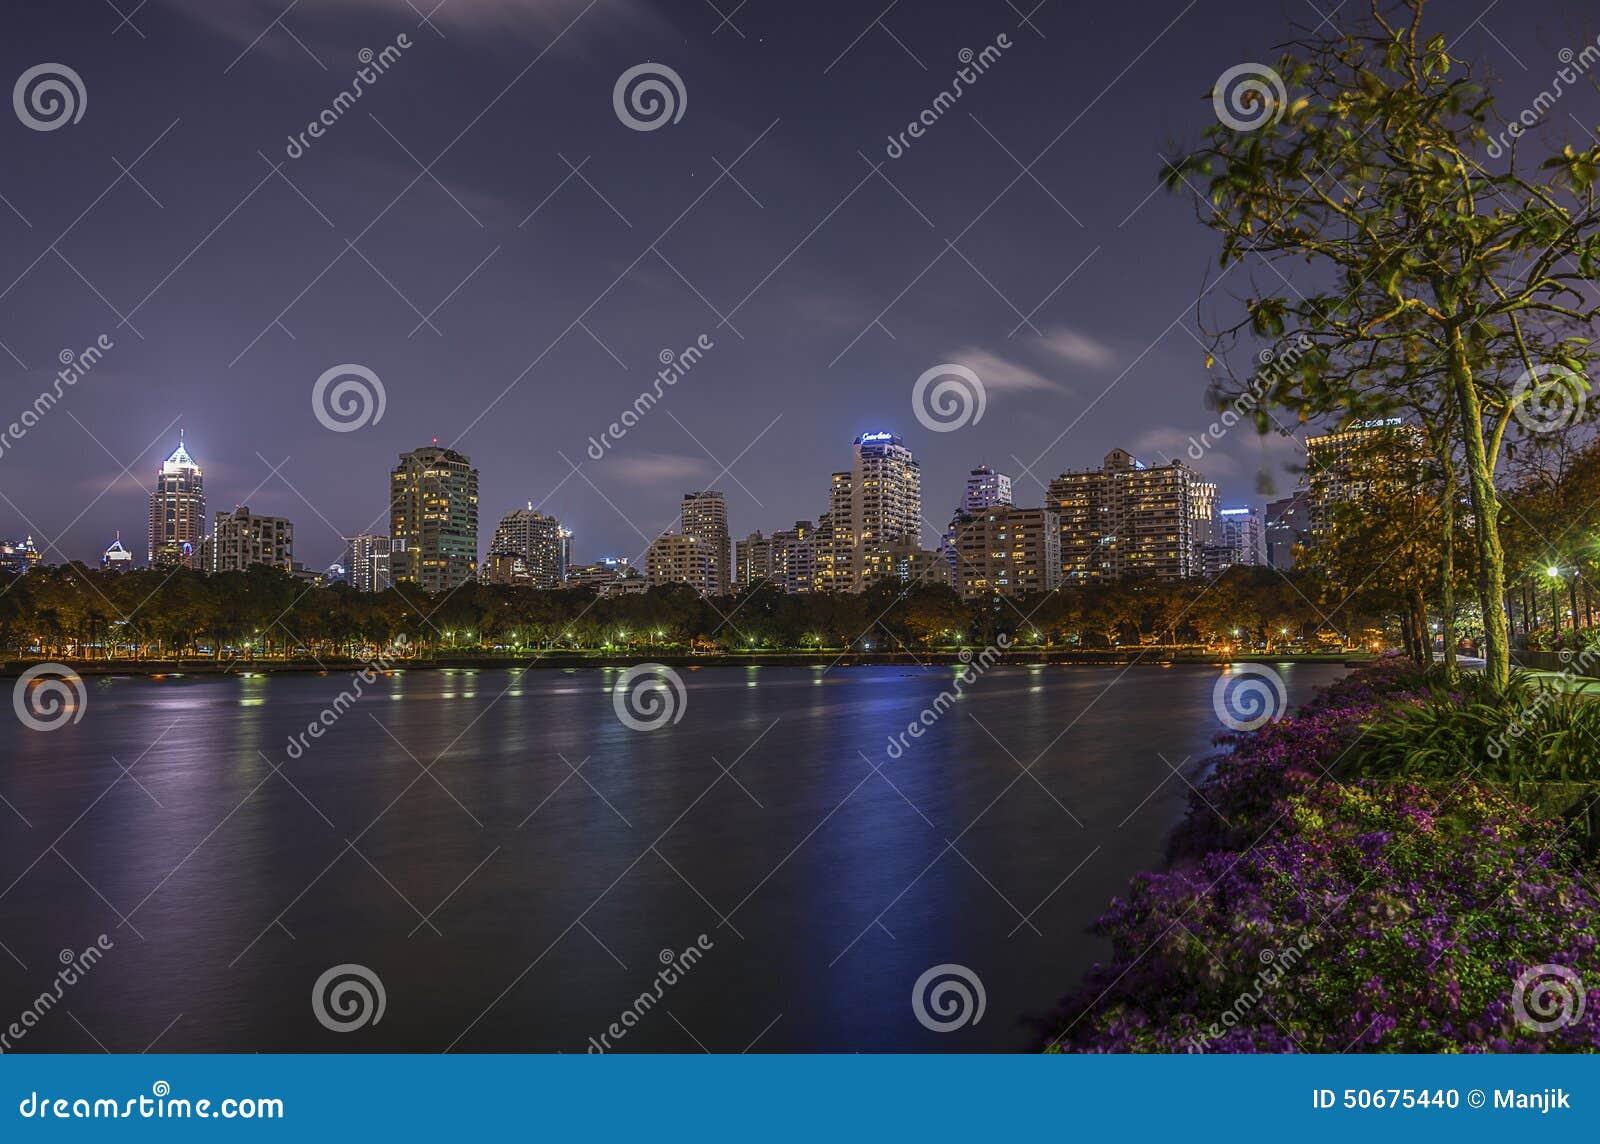 Download Benjasiri公园曼谷 库存照片. 图片 包括有 风景, 城市, 都市风景, 地平线, 公寓, 城镇 - 50675440